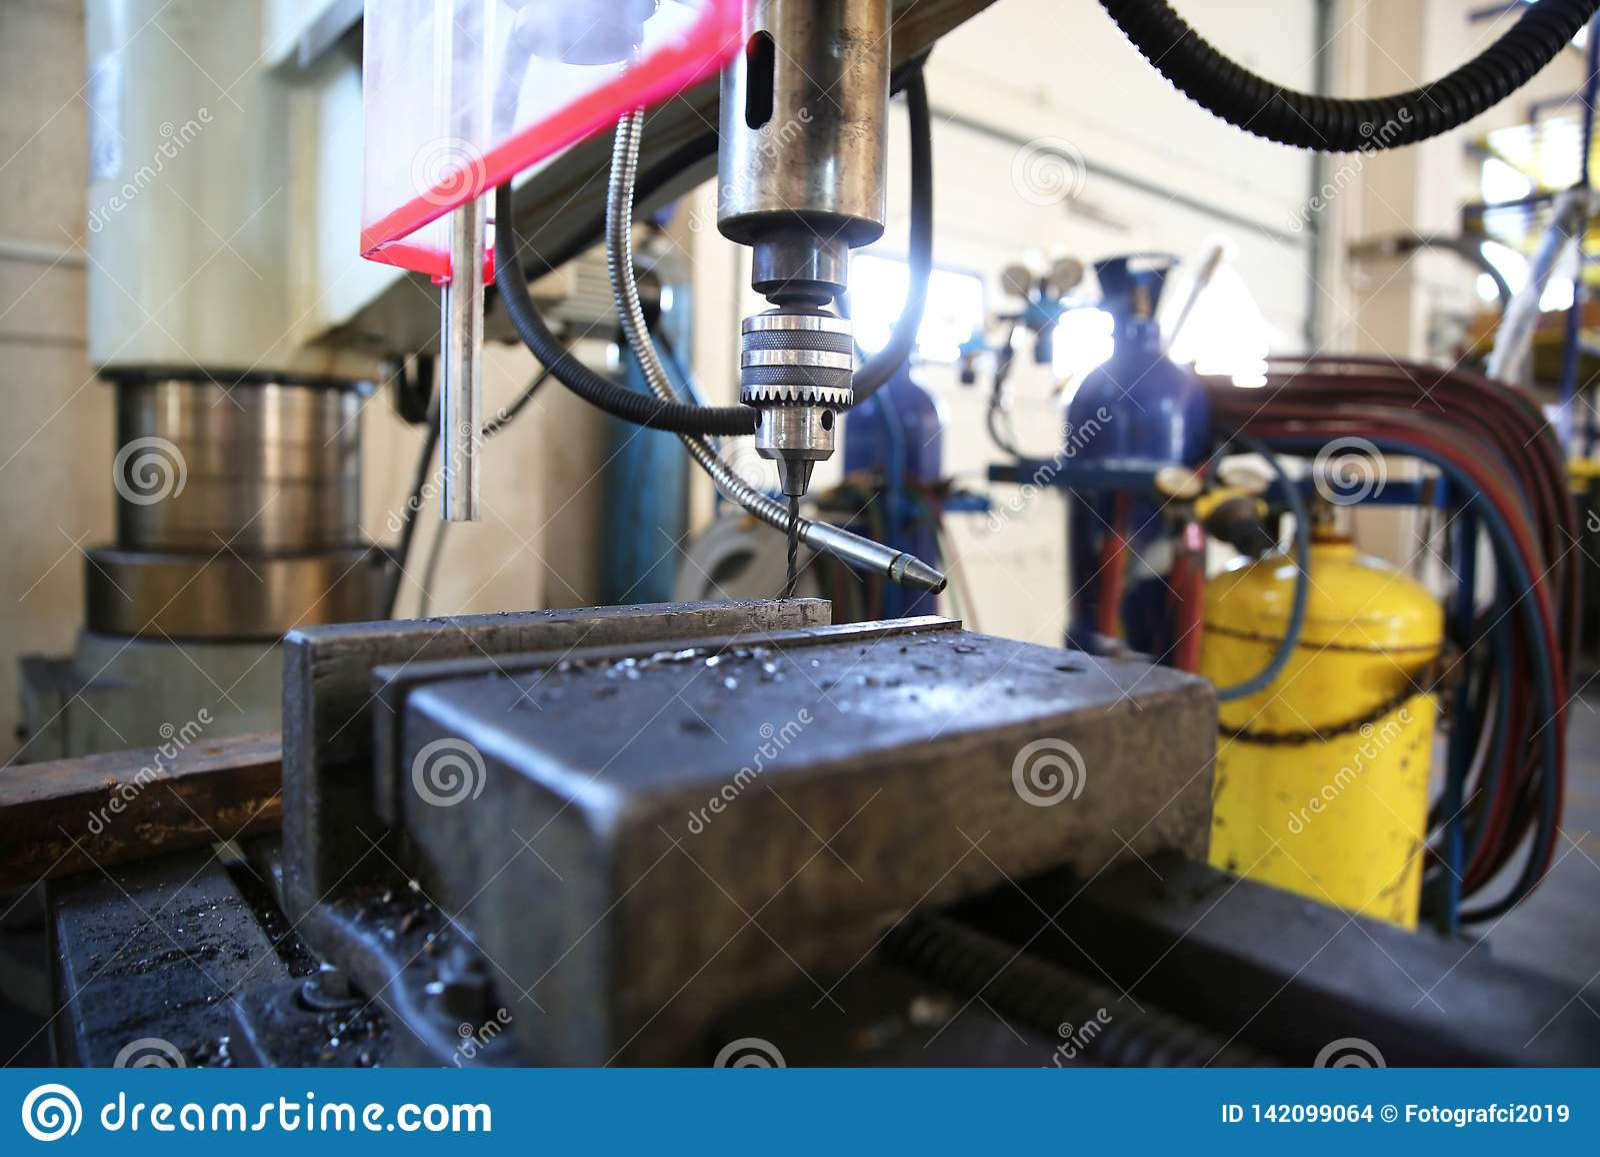 Industriel A Lathe Machine